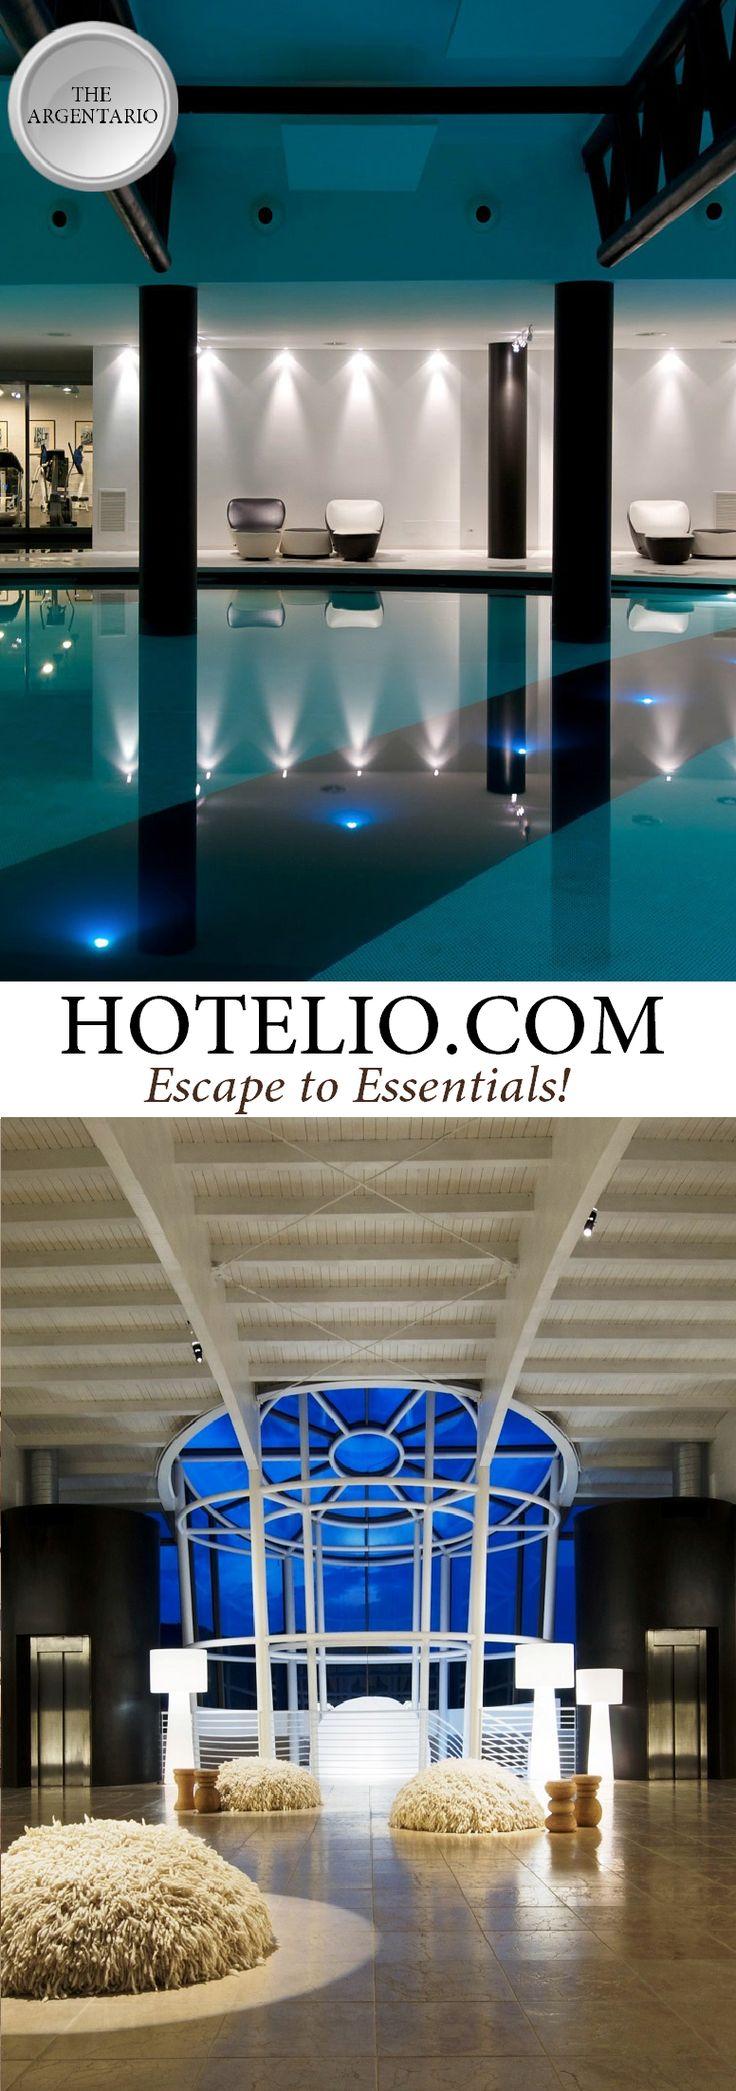 The Argentario Golf Resort and Spa    The luxury resort…